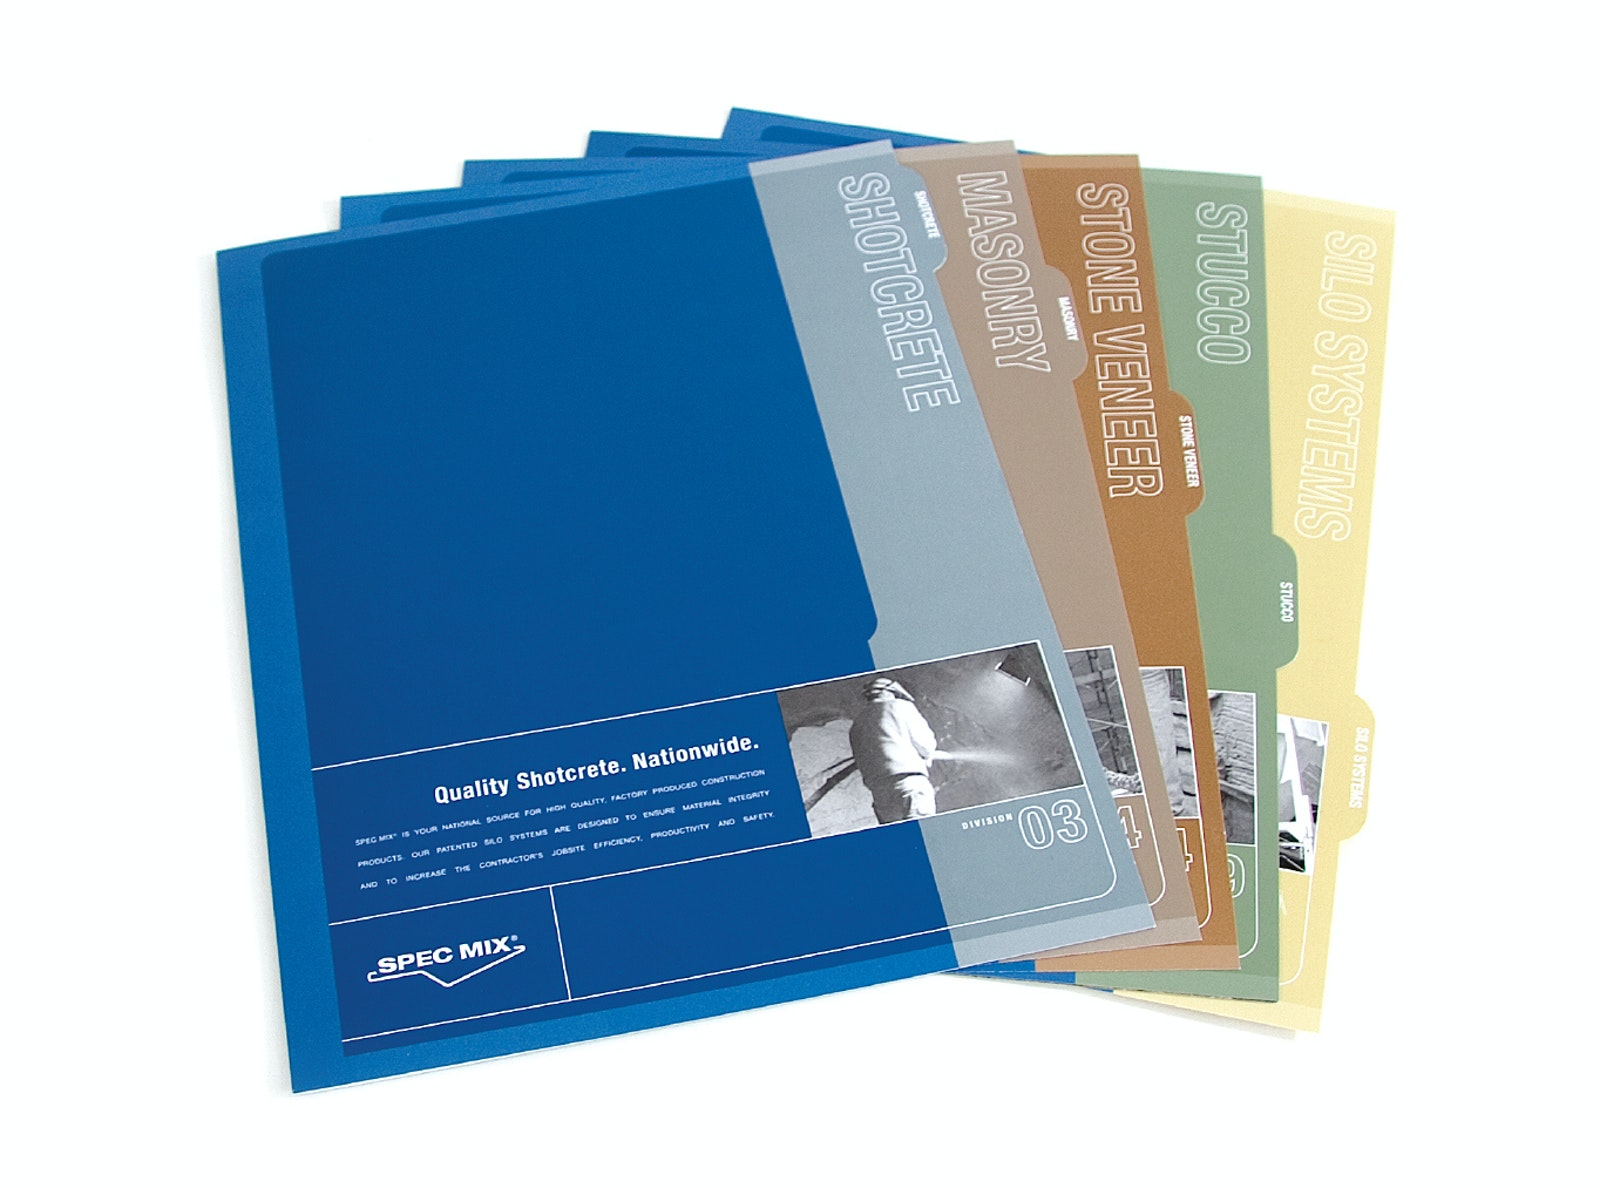 Specmix folders